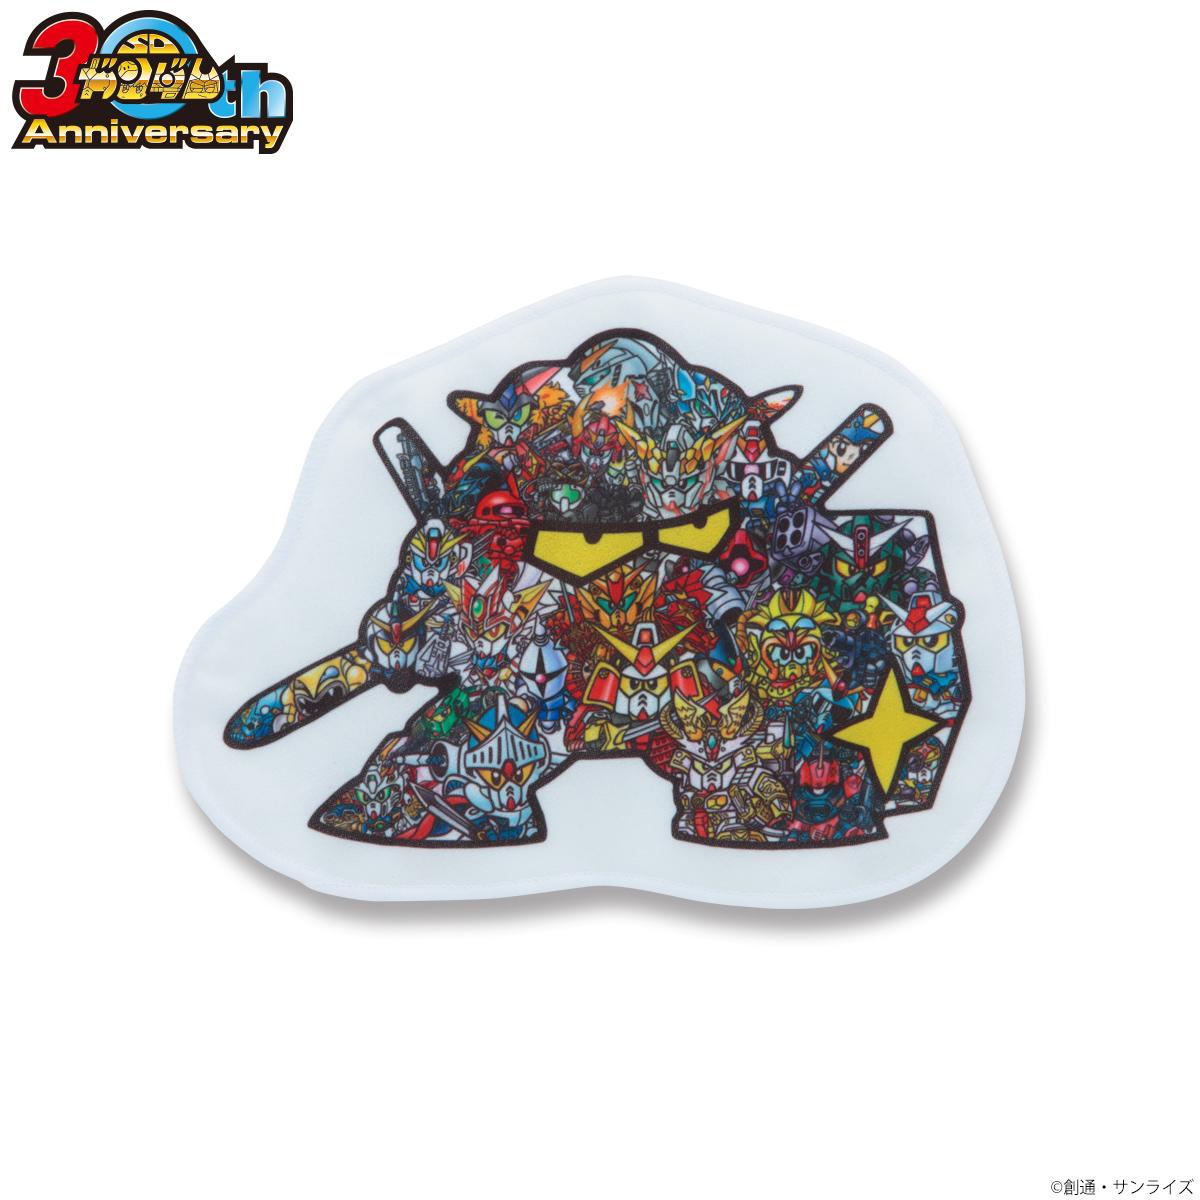 SD Gundam 30th Anniversary Mini Towel